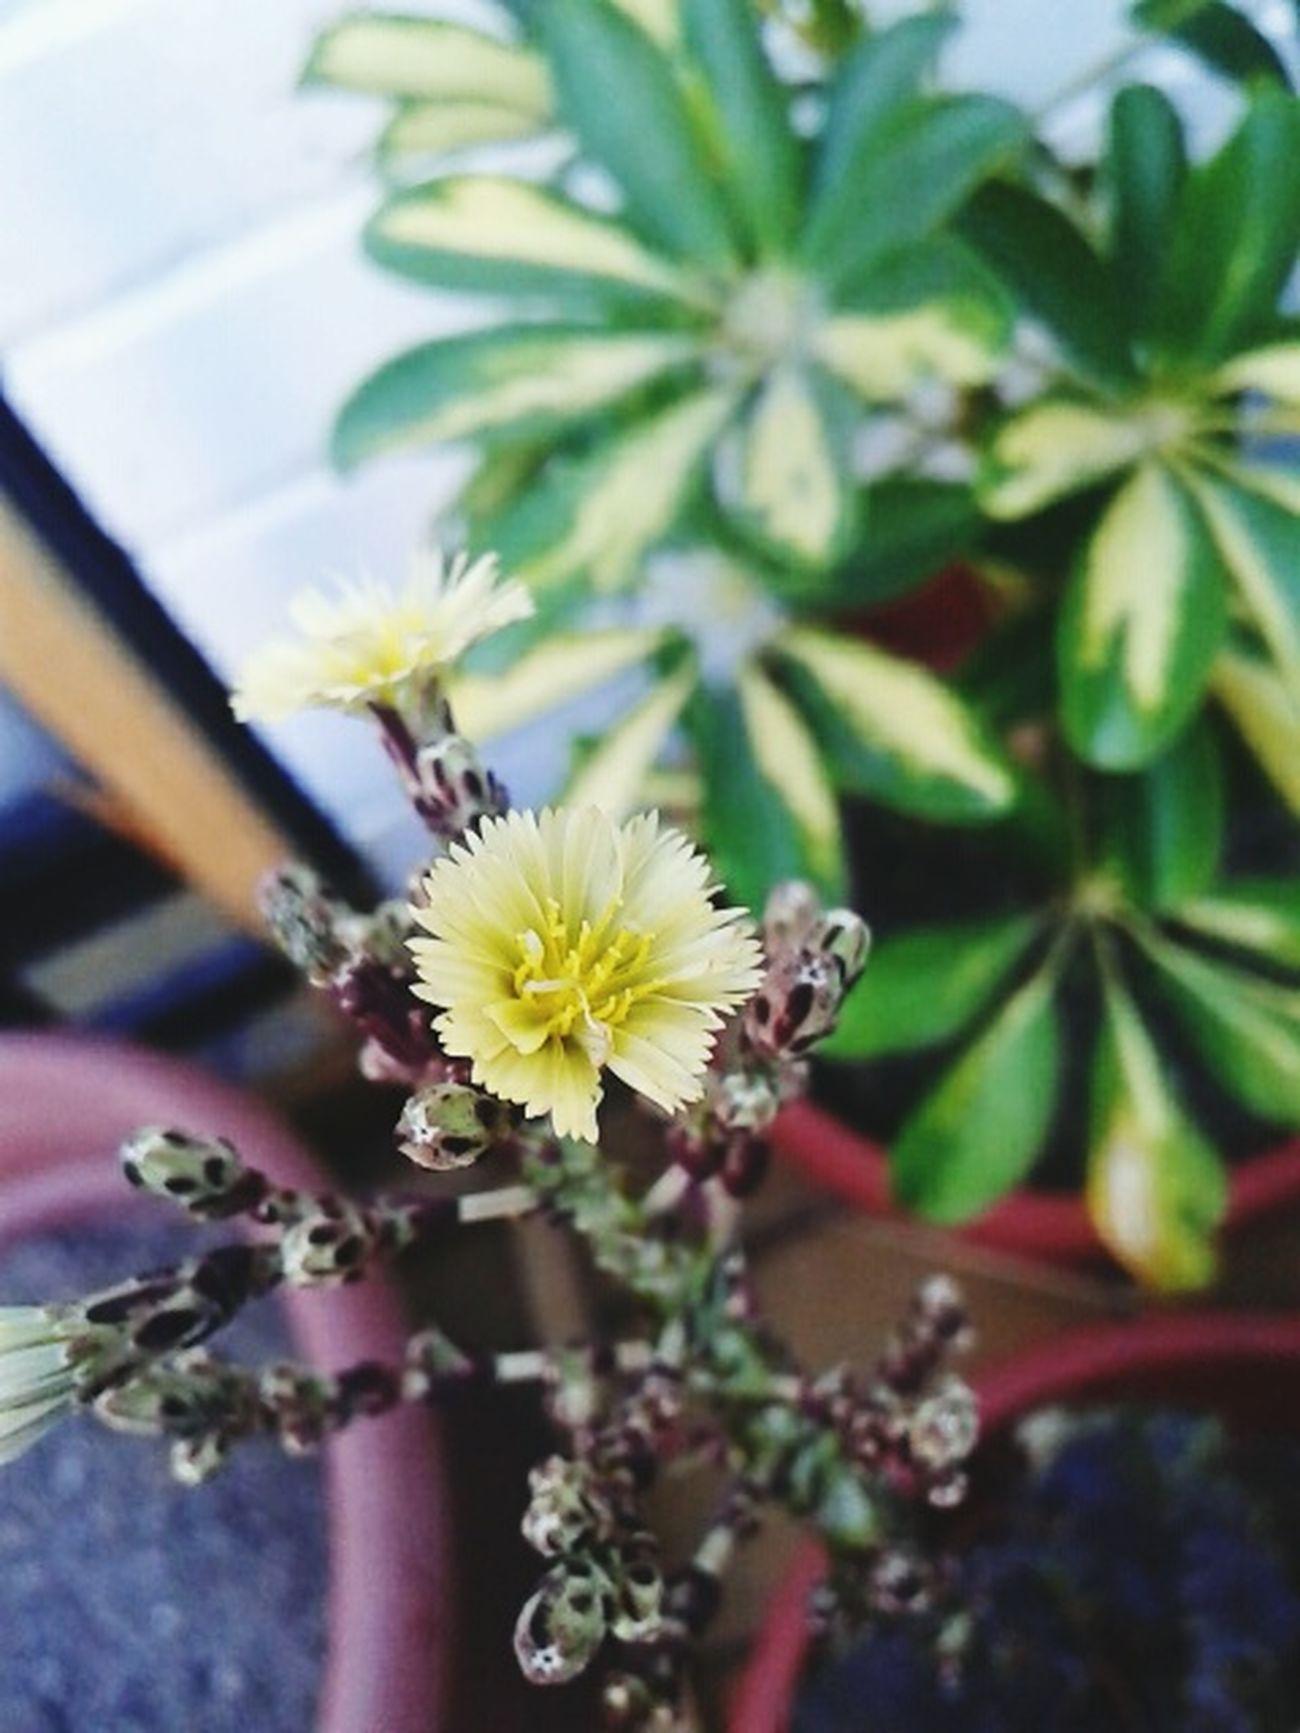 Agronomy Agronomia Nature Flowers Lechuga Letuce Chile Green